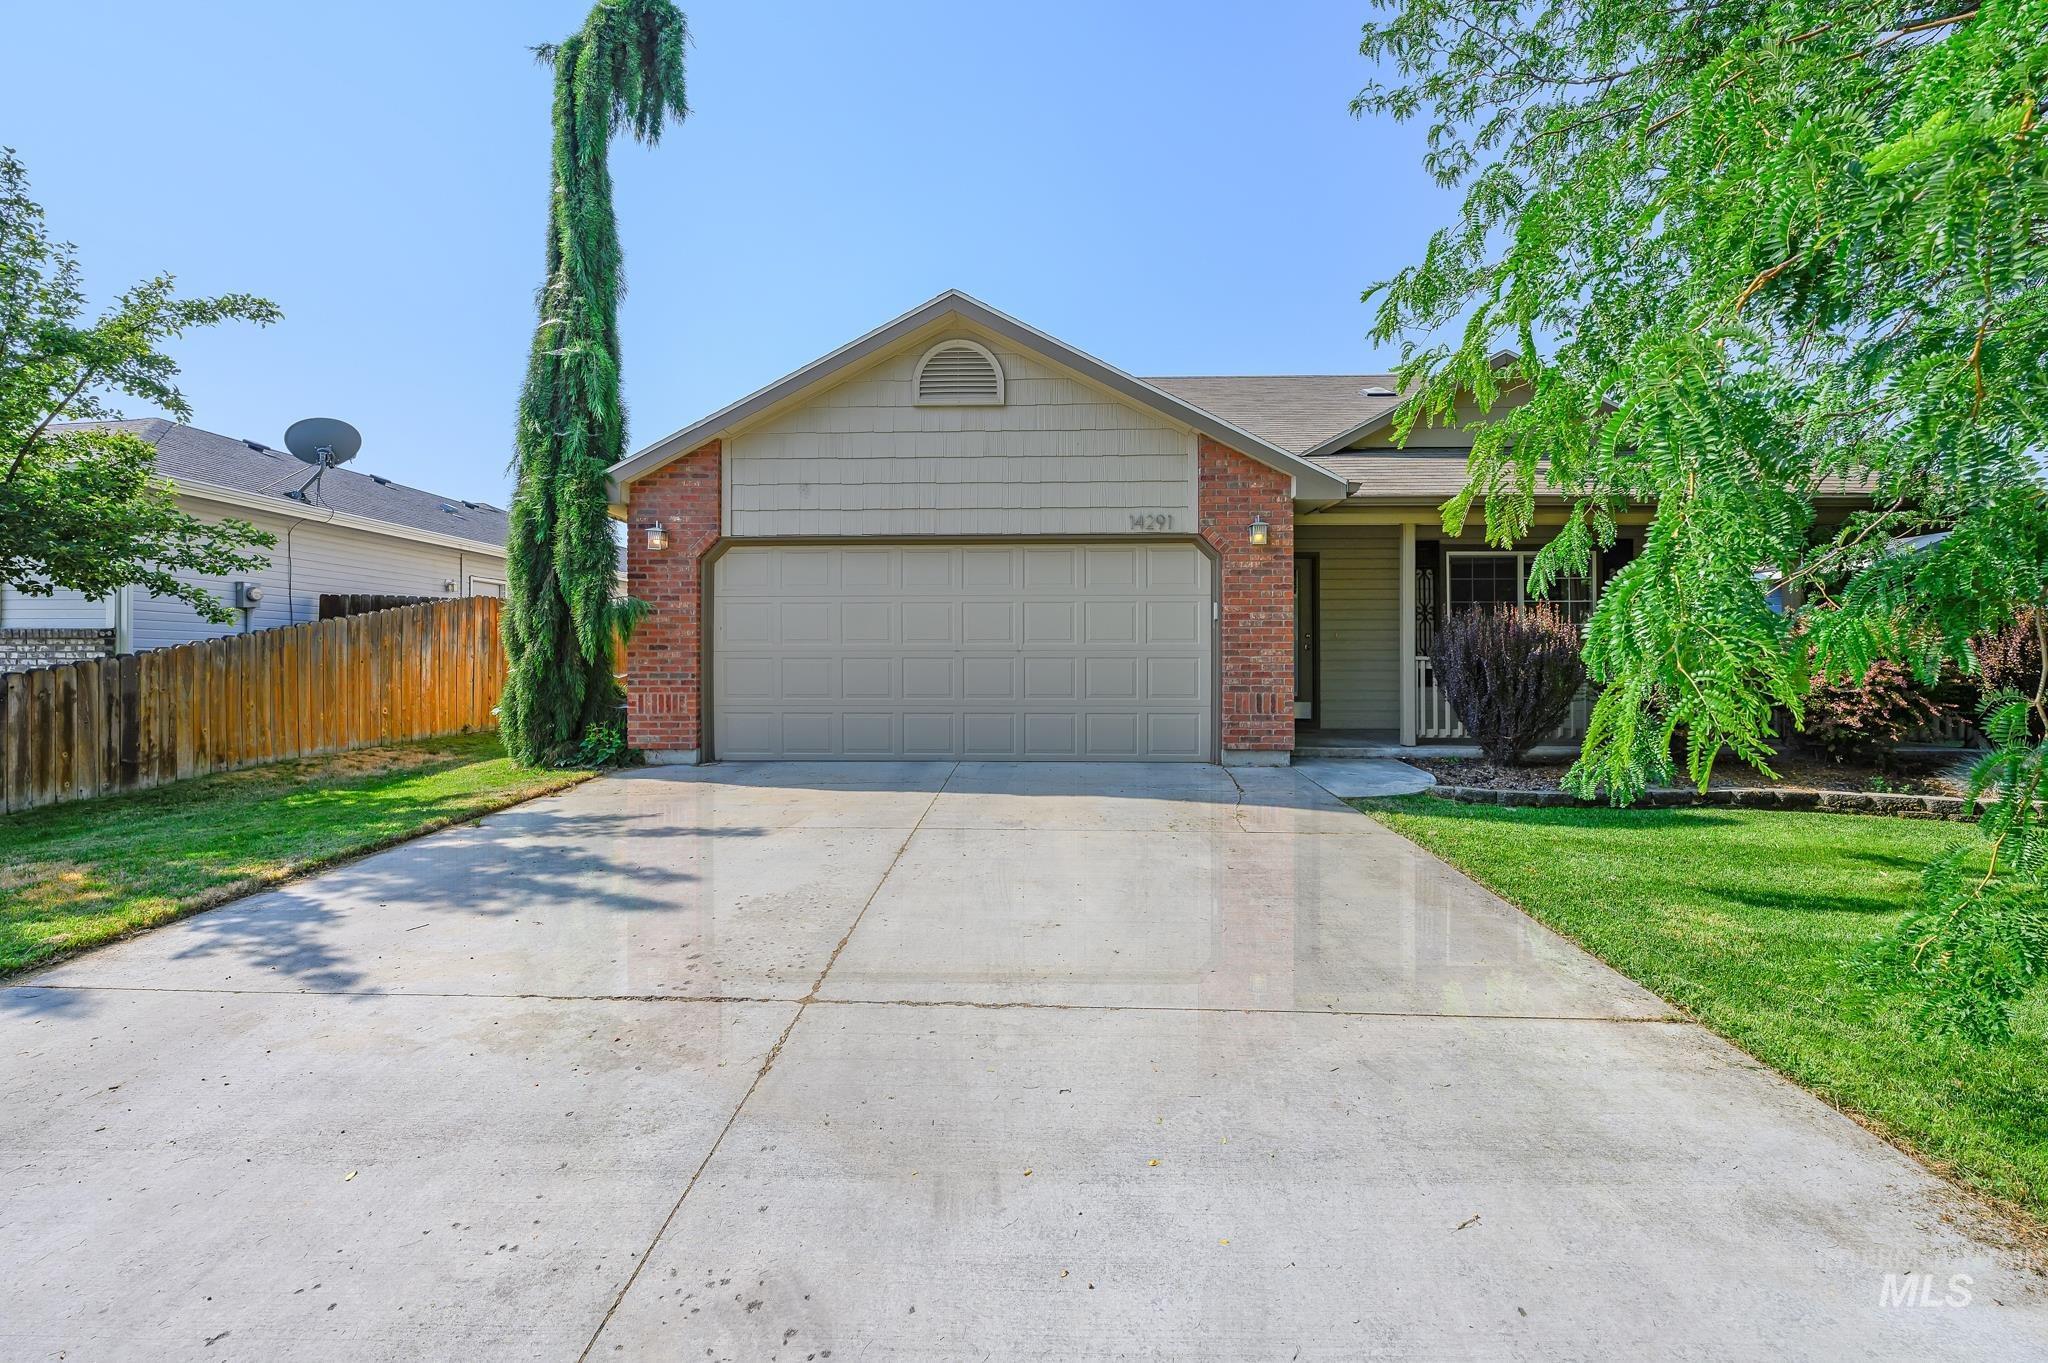 14291 W Comisky Property Photo